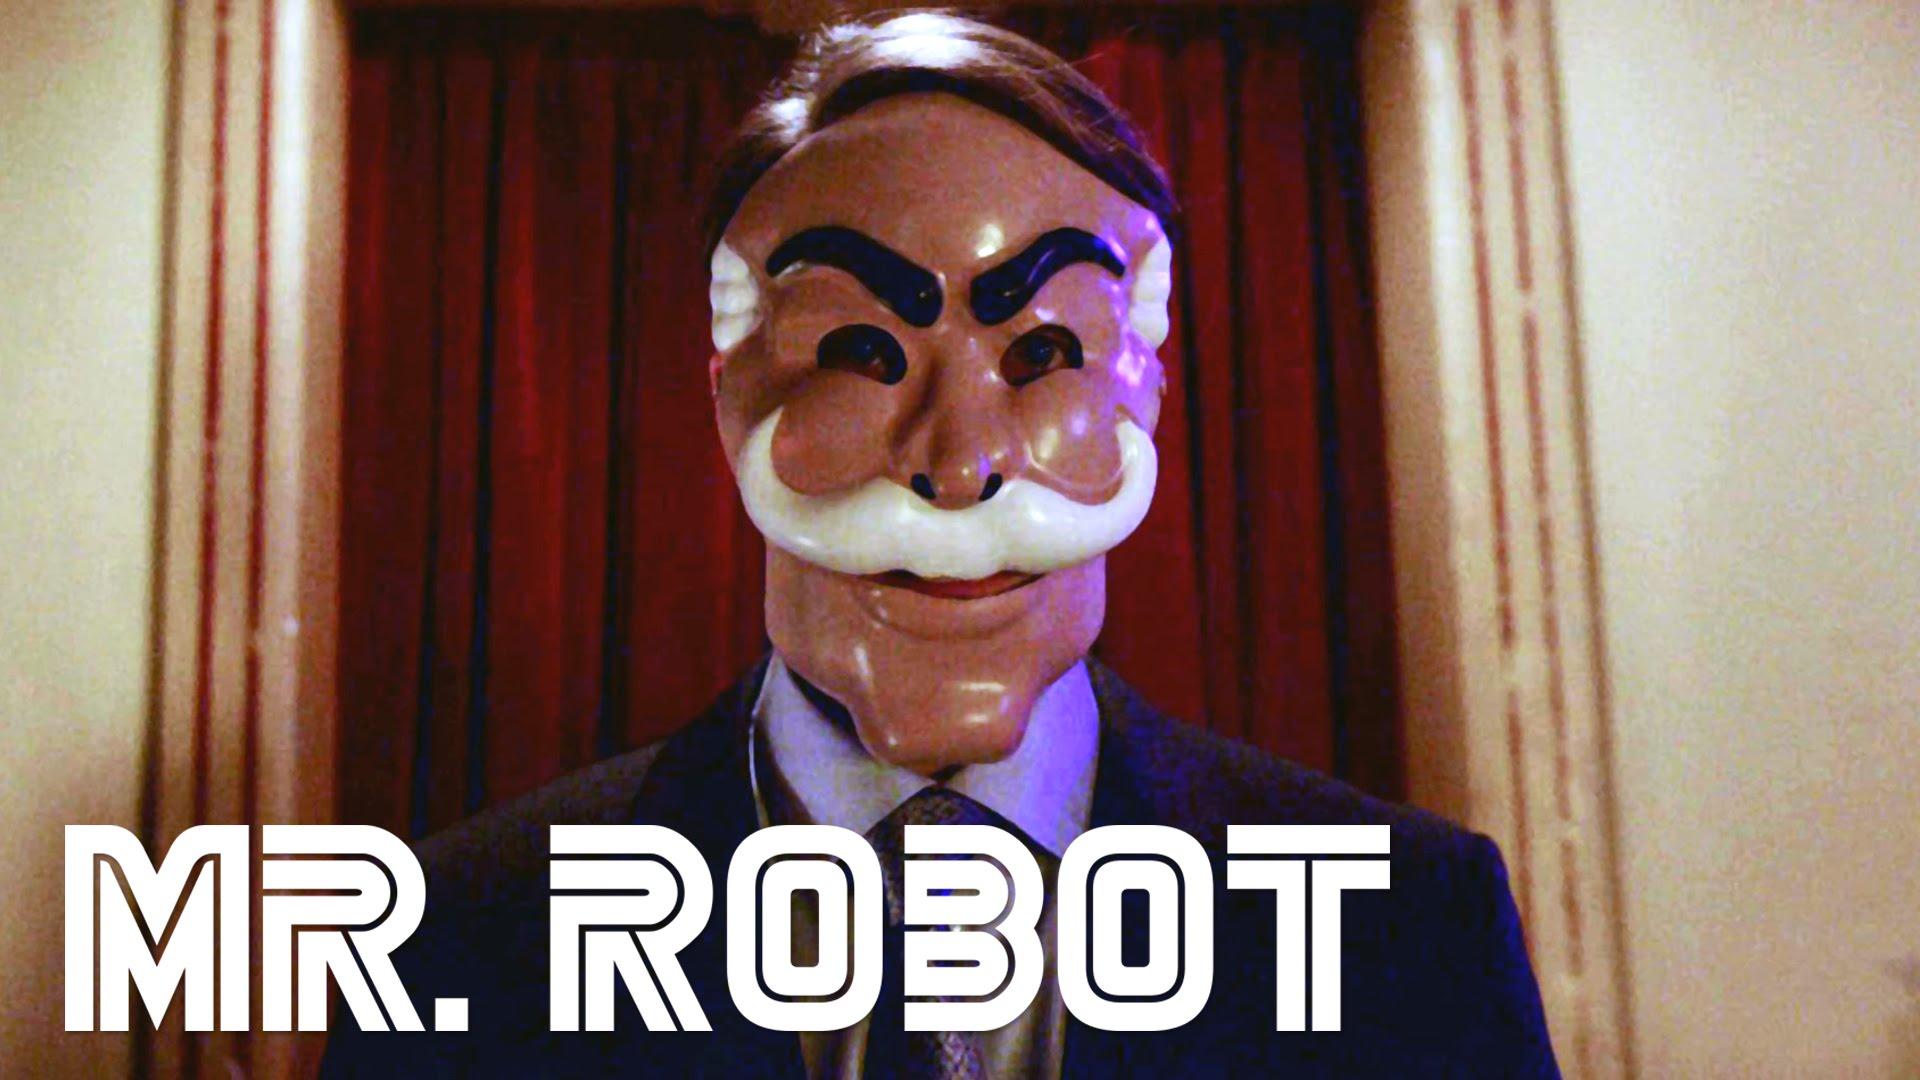 Mr Robot Season 2 Trailer